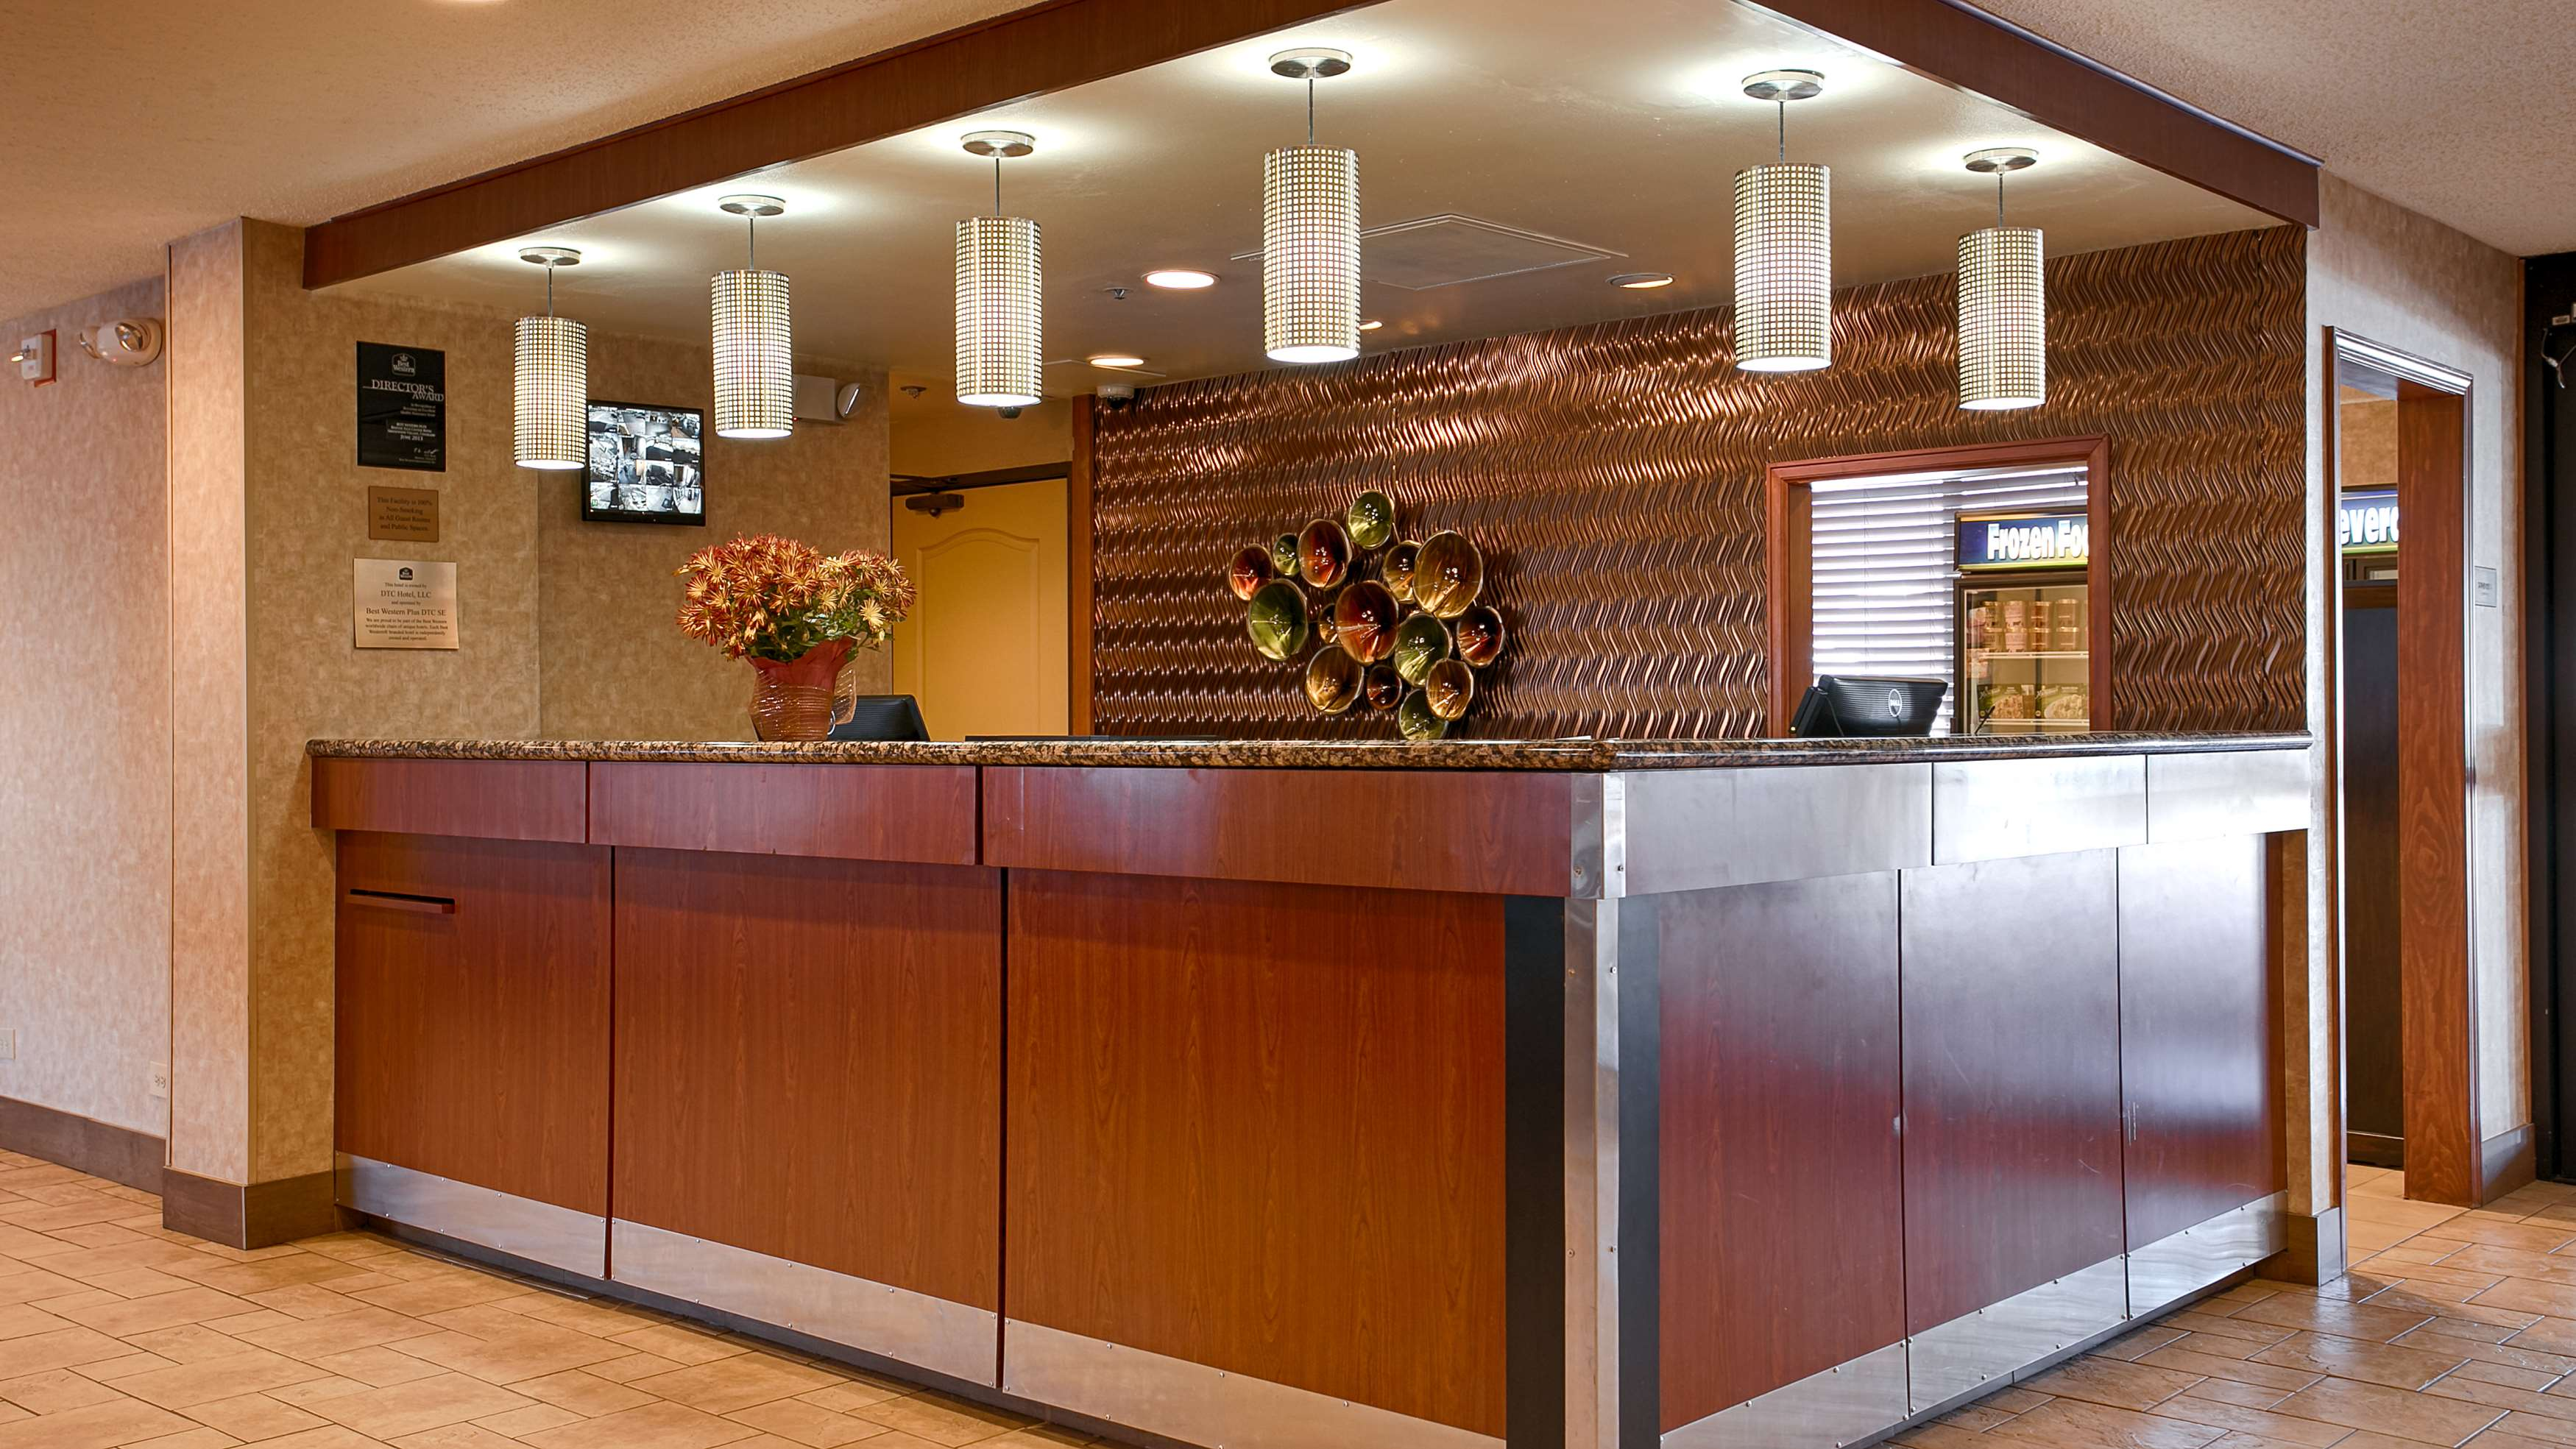 Best Western Plus Denver Tech Center Hotel image 26